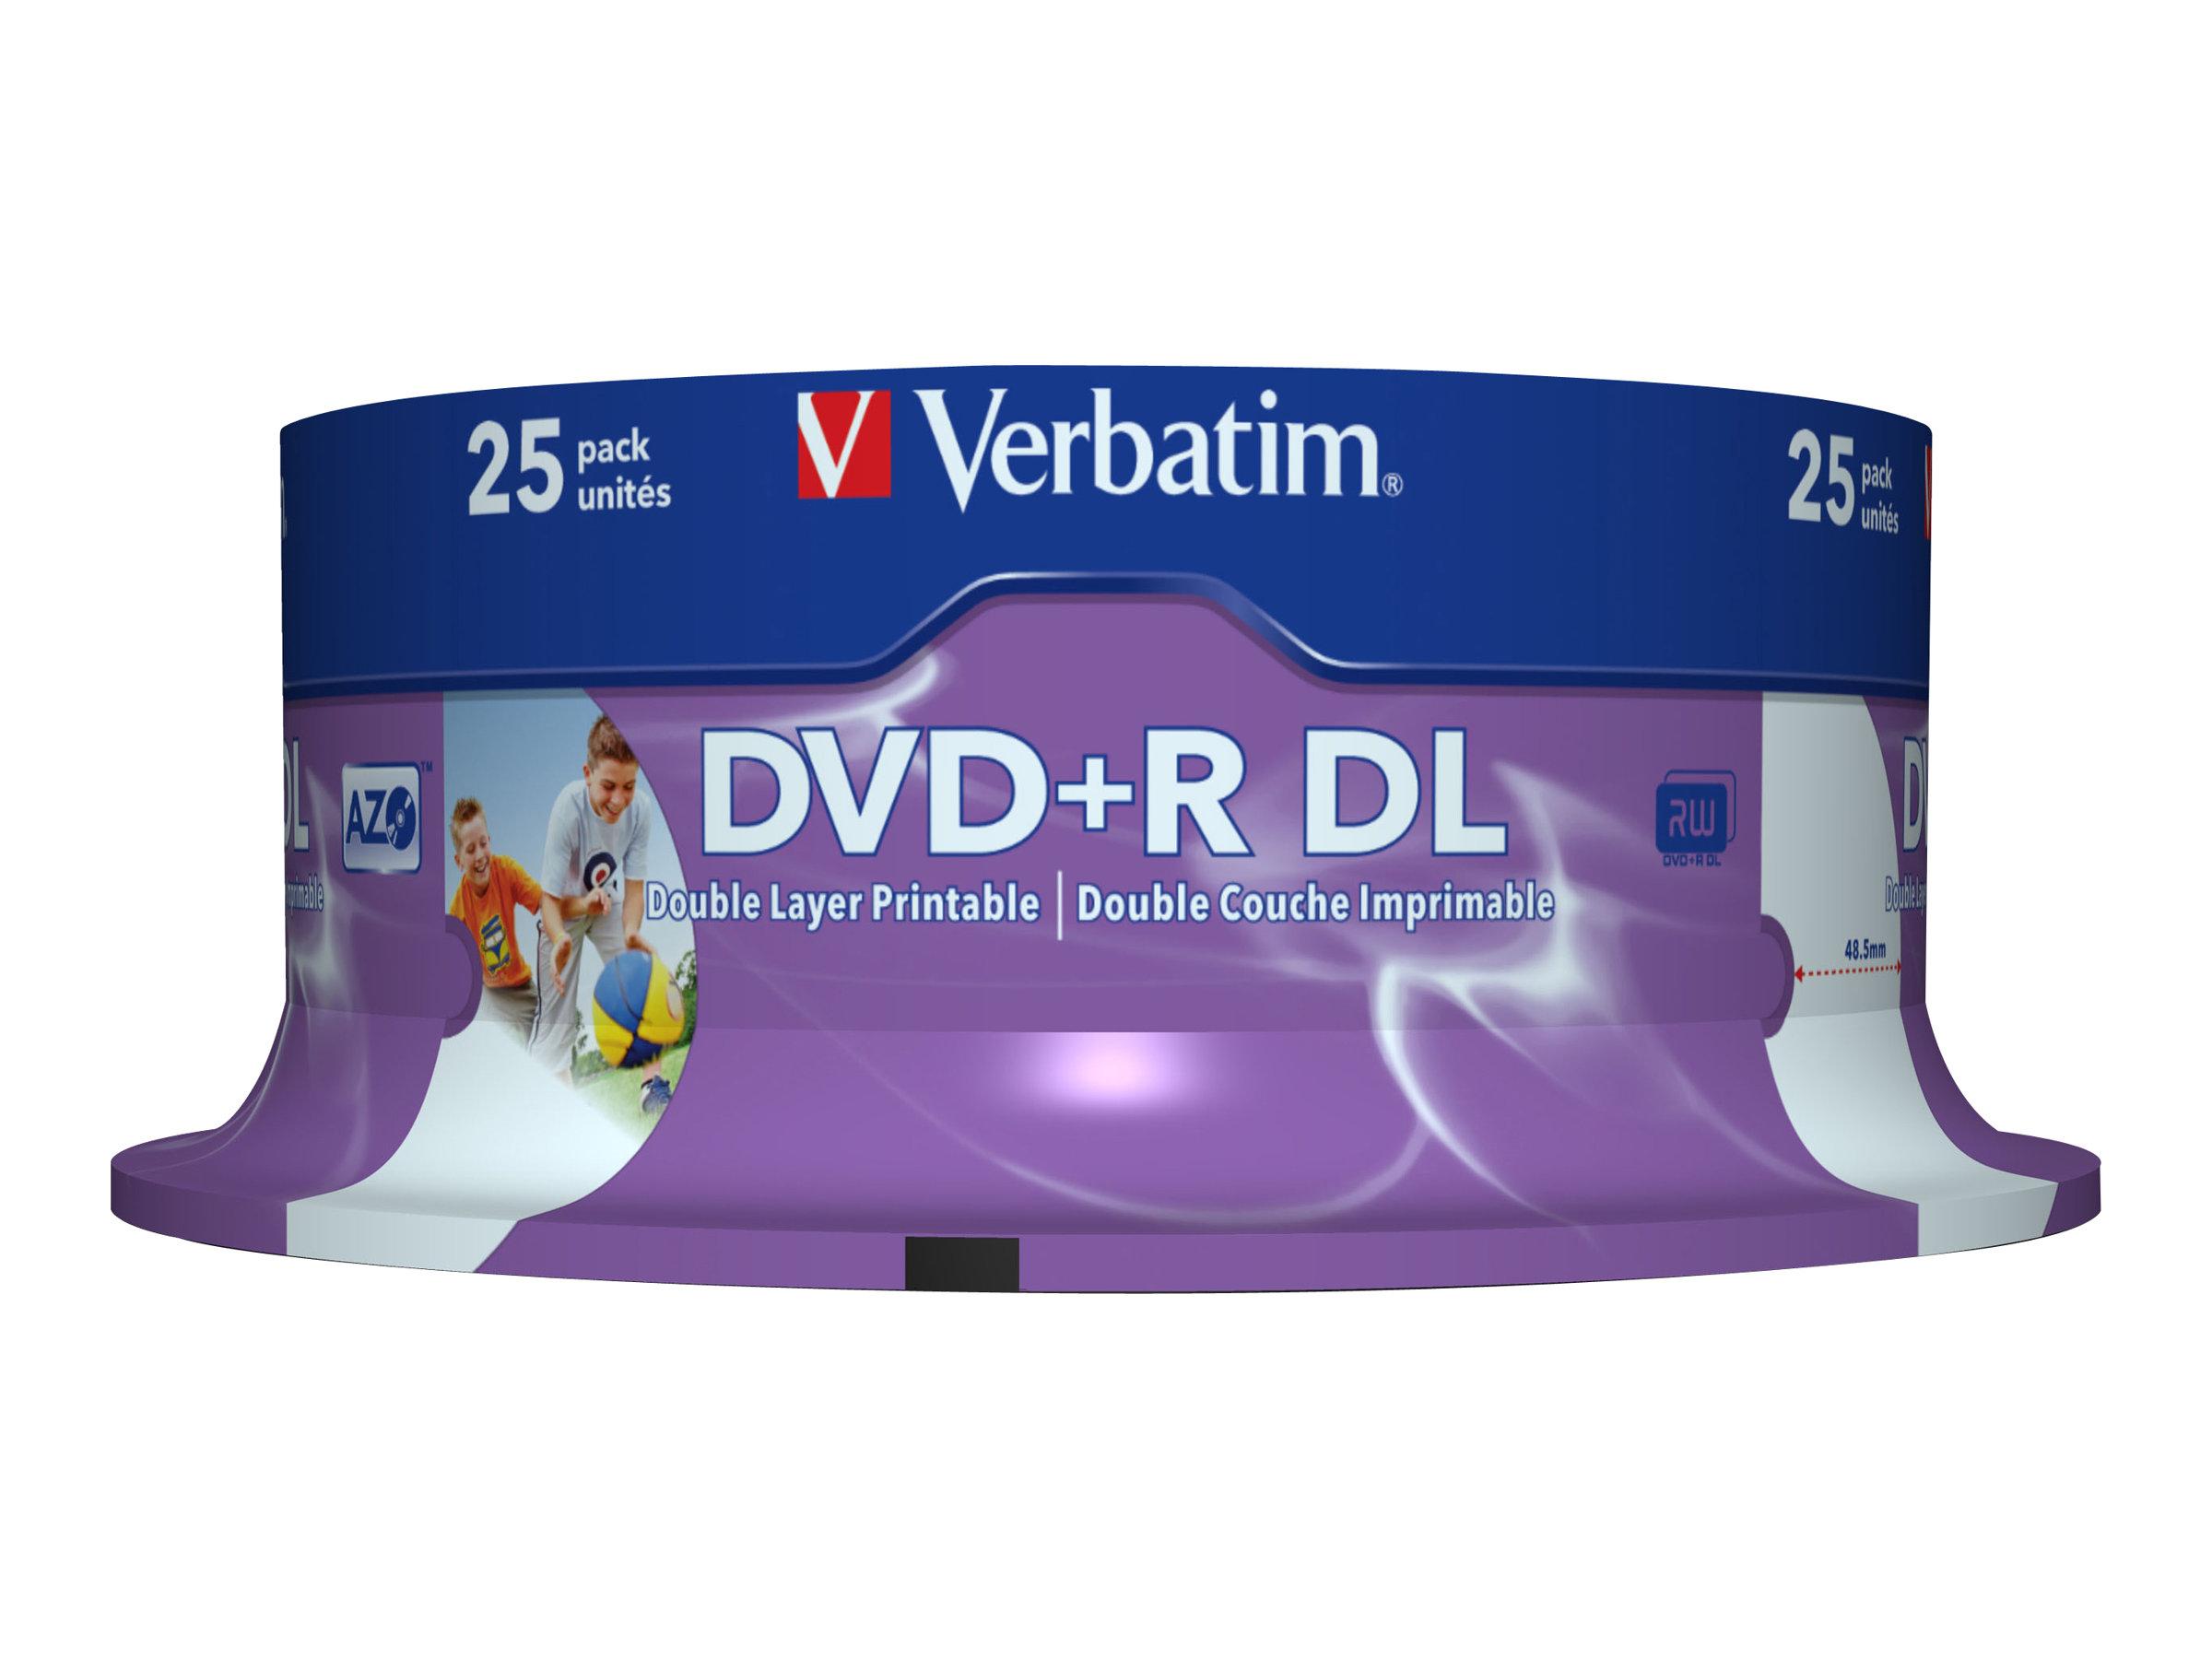 Verbatim 25 x DVD+R DL - 8.5 GB 8x - breite bedruckbare Oberfläche